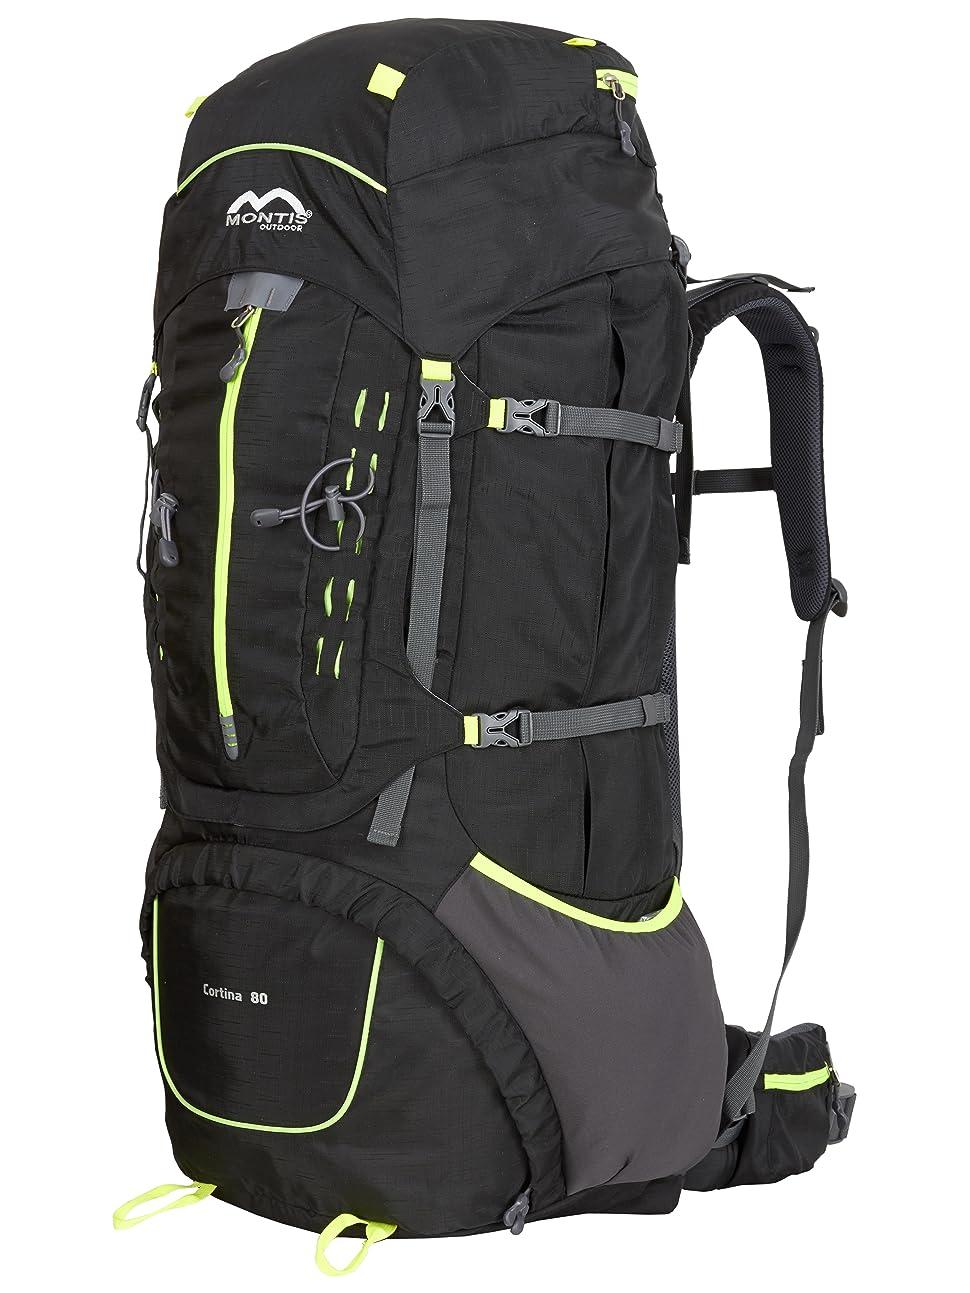 Montis Cortina 80 - Mochila de trekking y senderismo - 80++ l - 88 x 38 - 2100 g